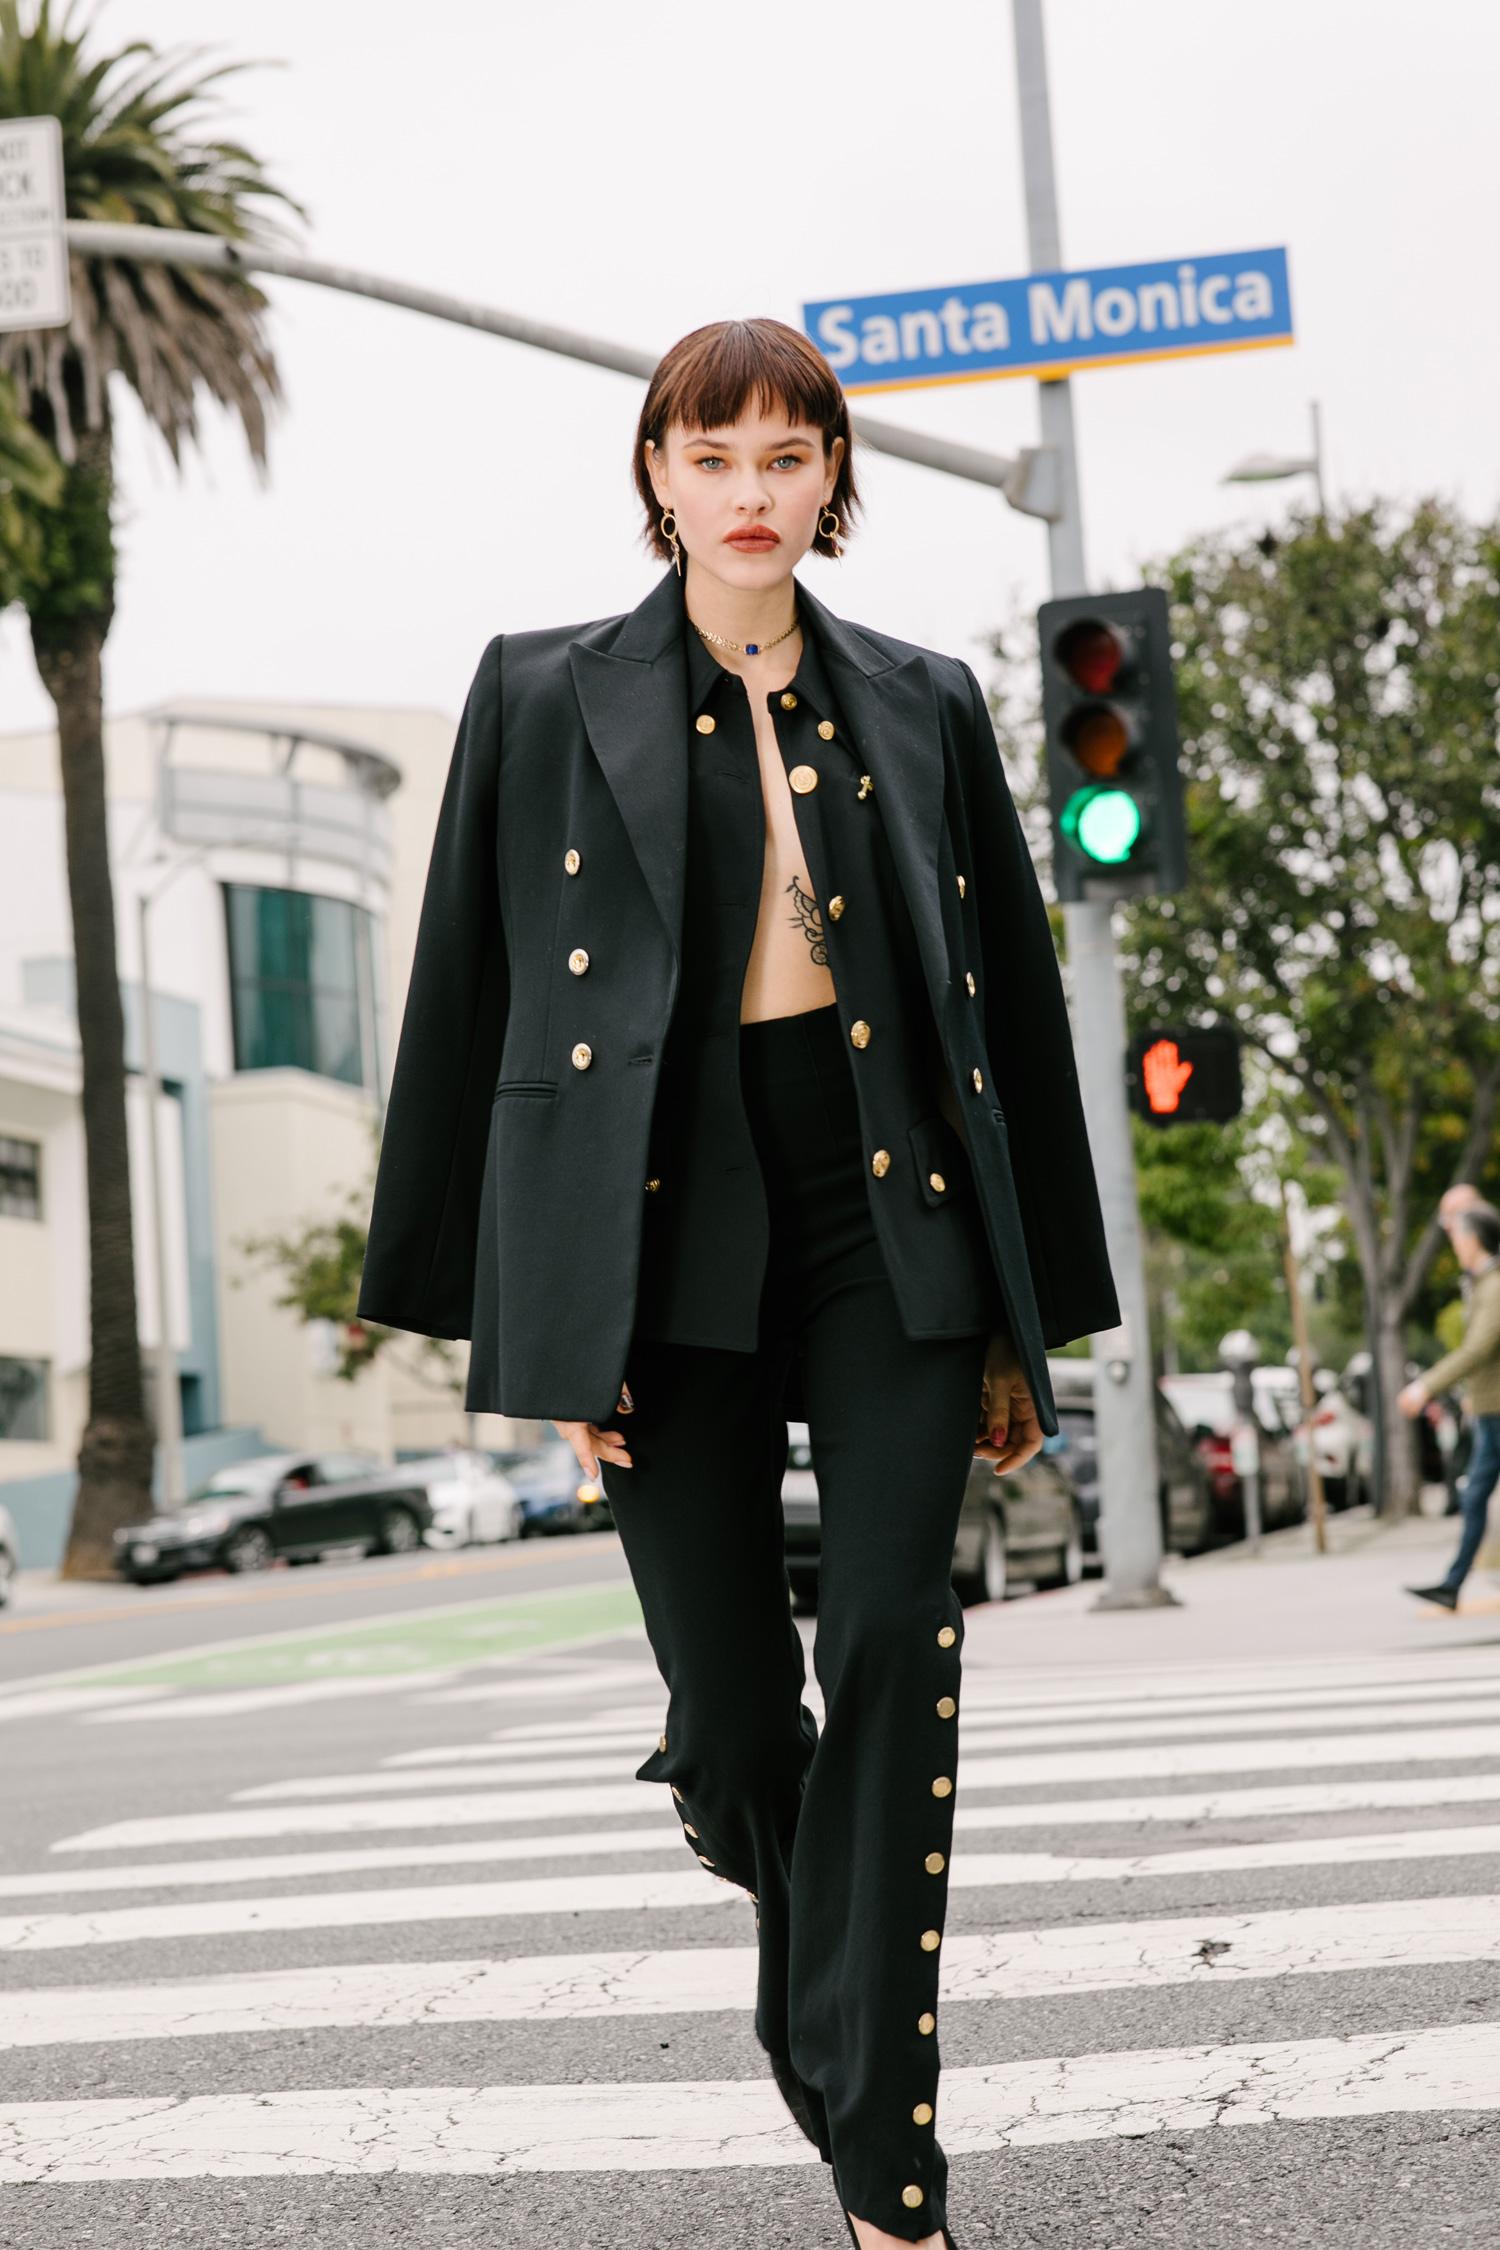 020-LA-Urban-Street-Style.jpg